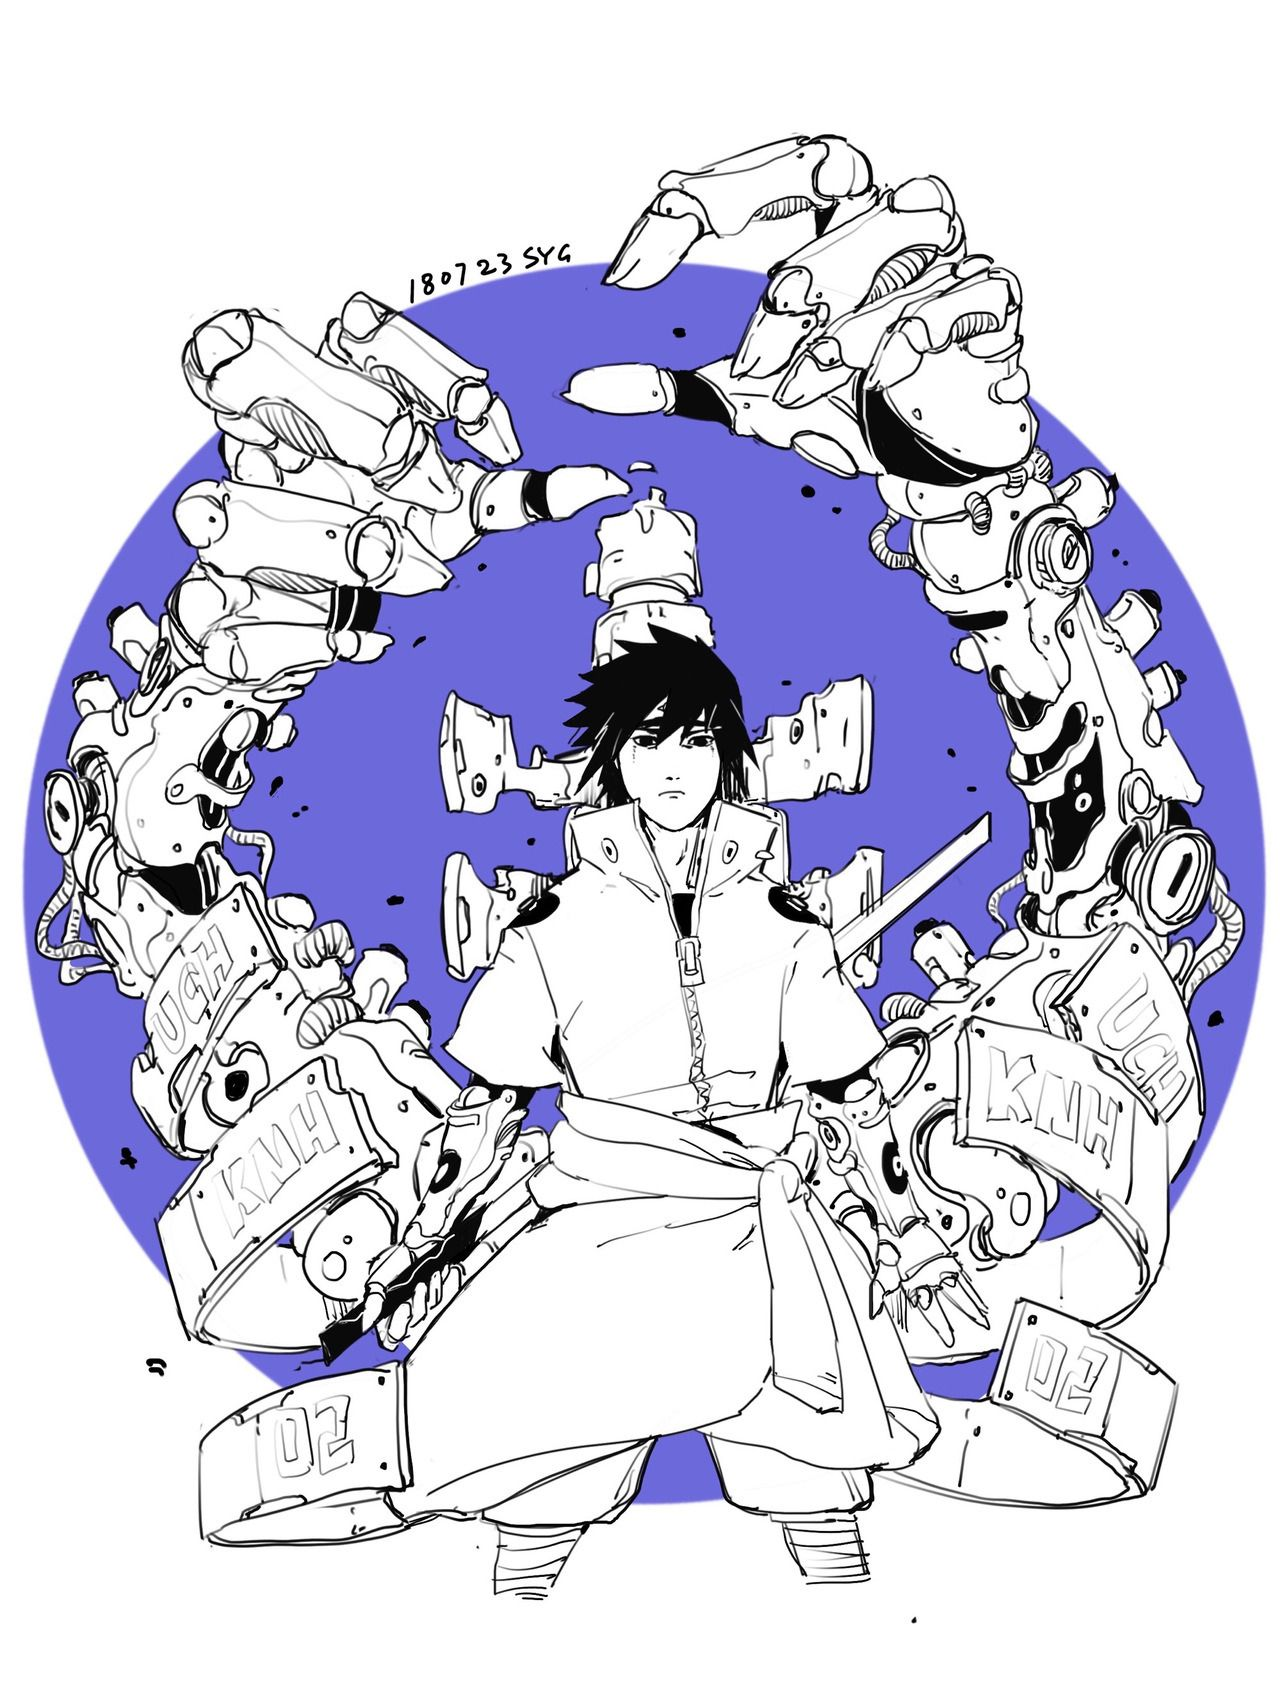 Fine I Ll Sign Up Cyberpunk Team 7 And Hokage Itachi By Syg Alita Battle Angel Manga Anime Superhero Itachi